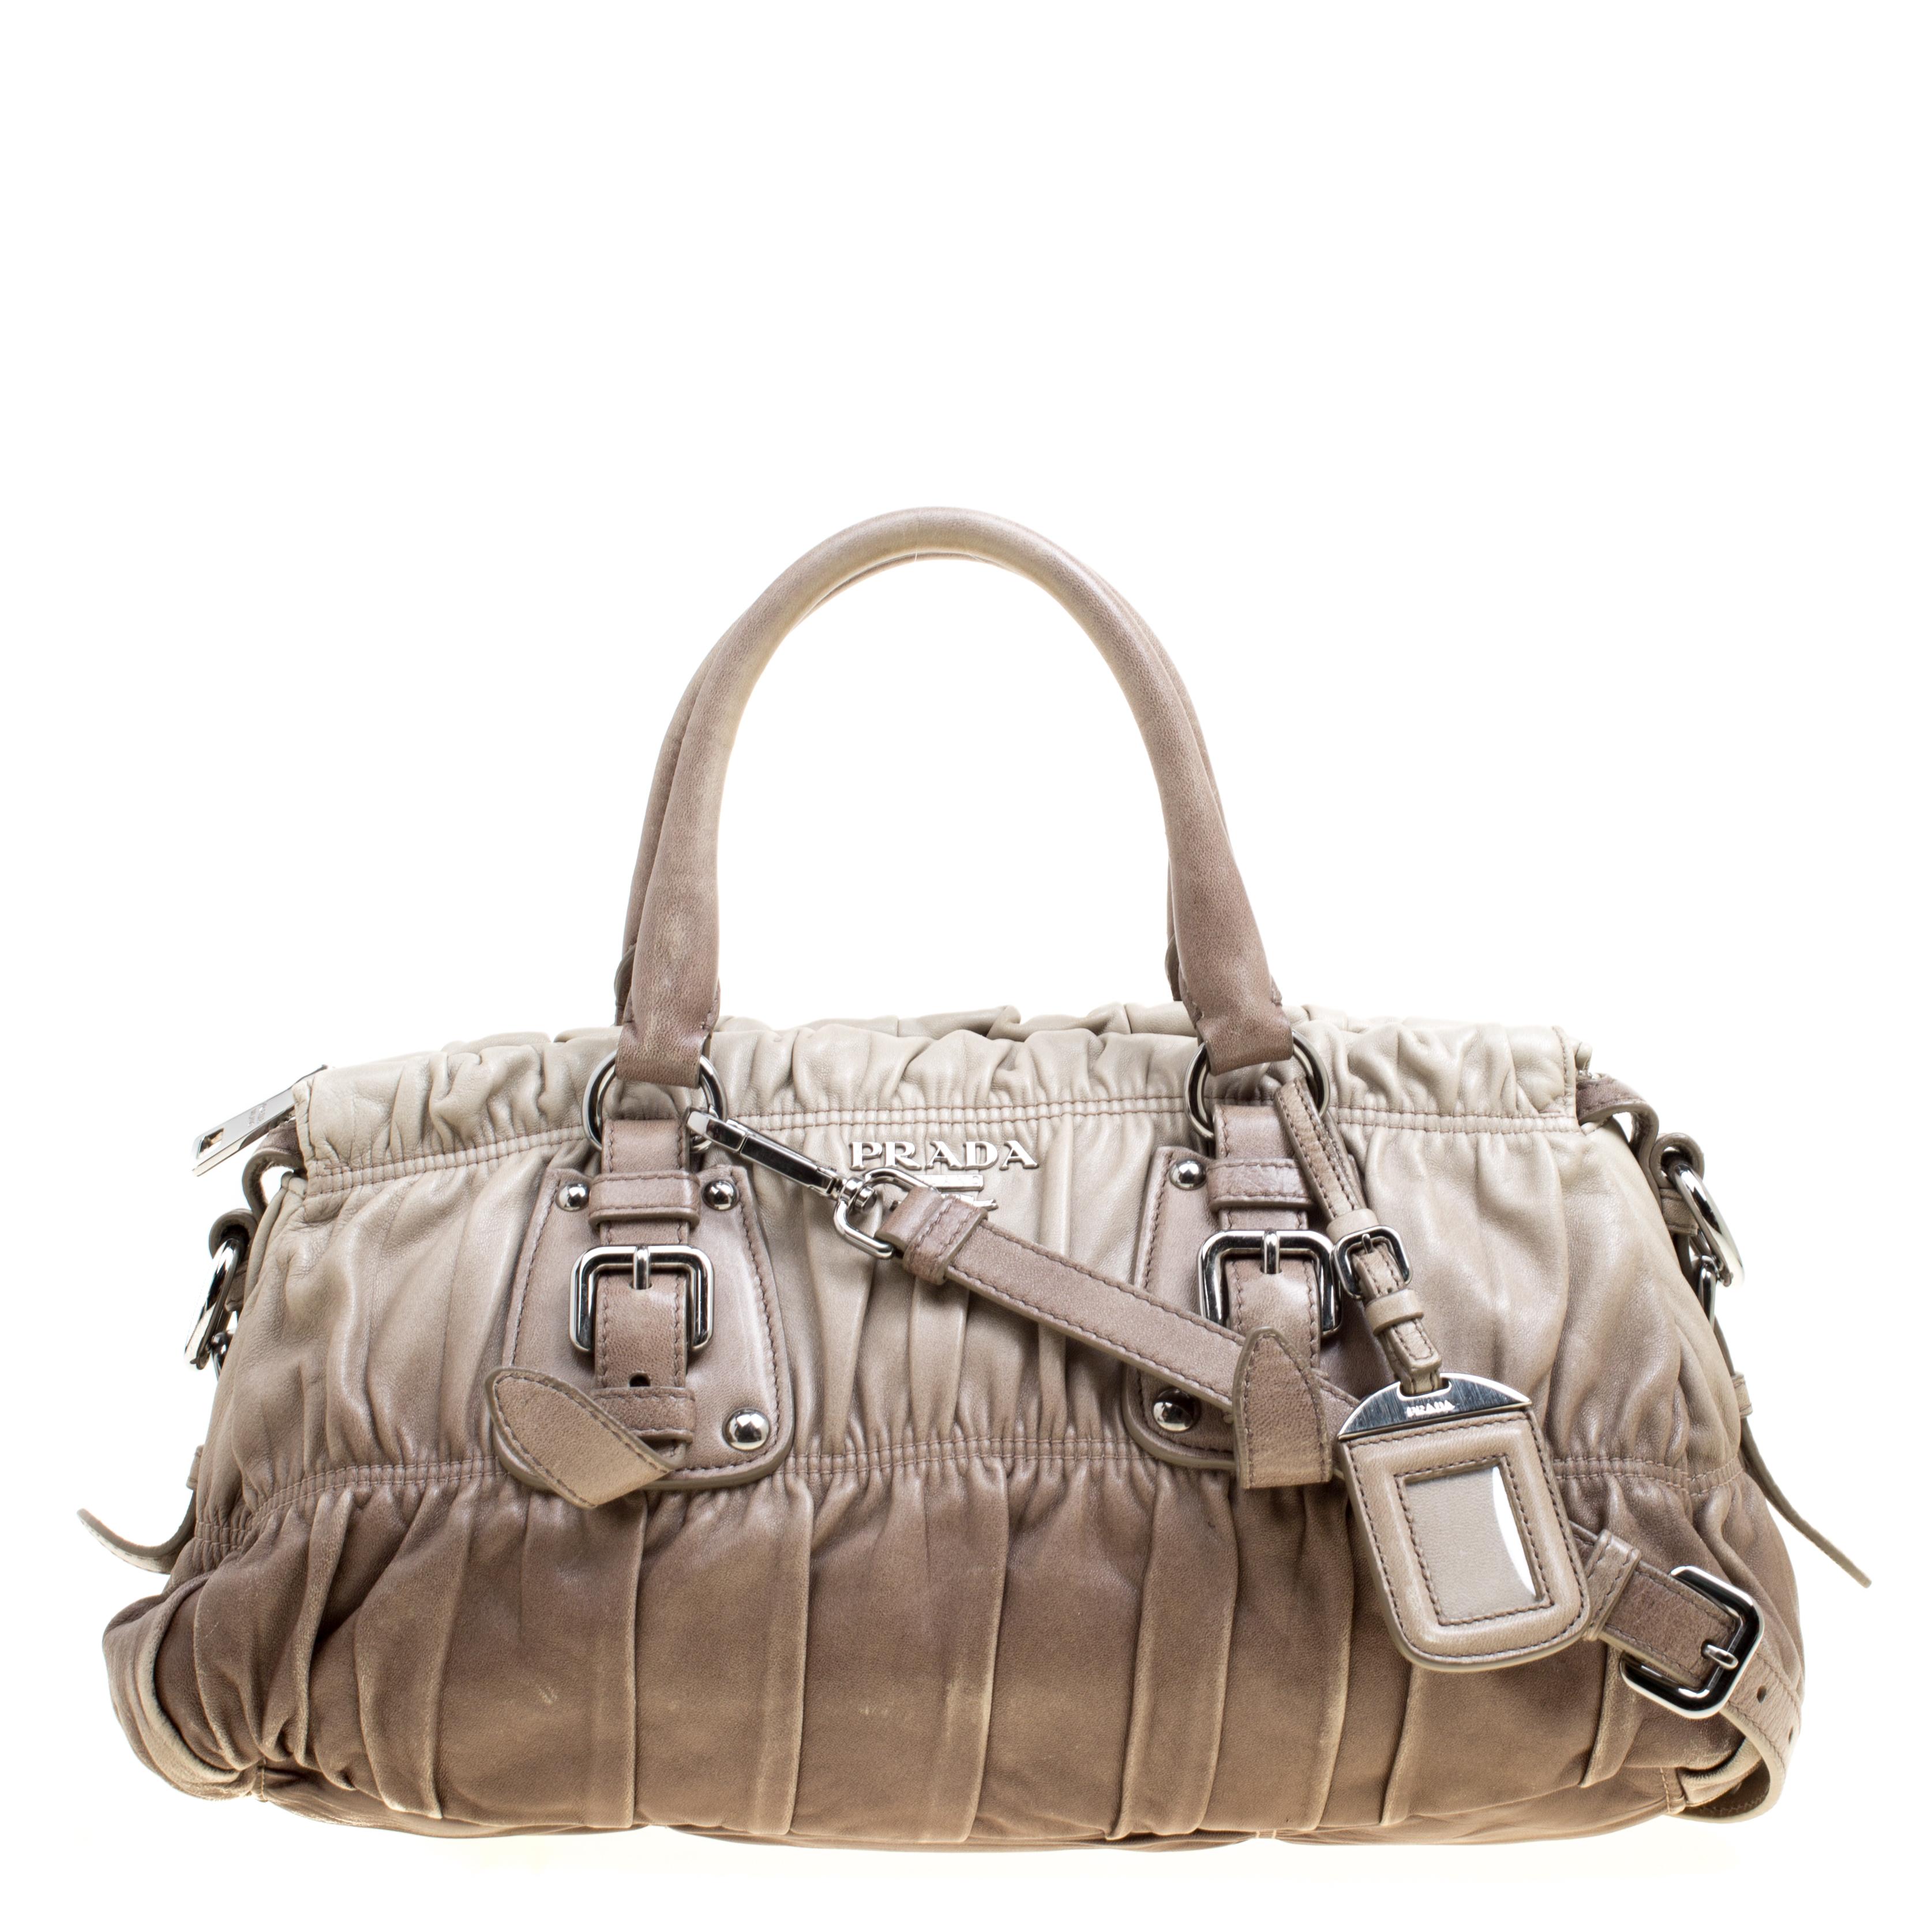 d1004d1d3e65 Buy Prada Beige Grey Ombre Nappa Gaufre Leather Top Handle Bag ...